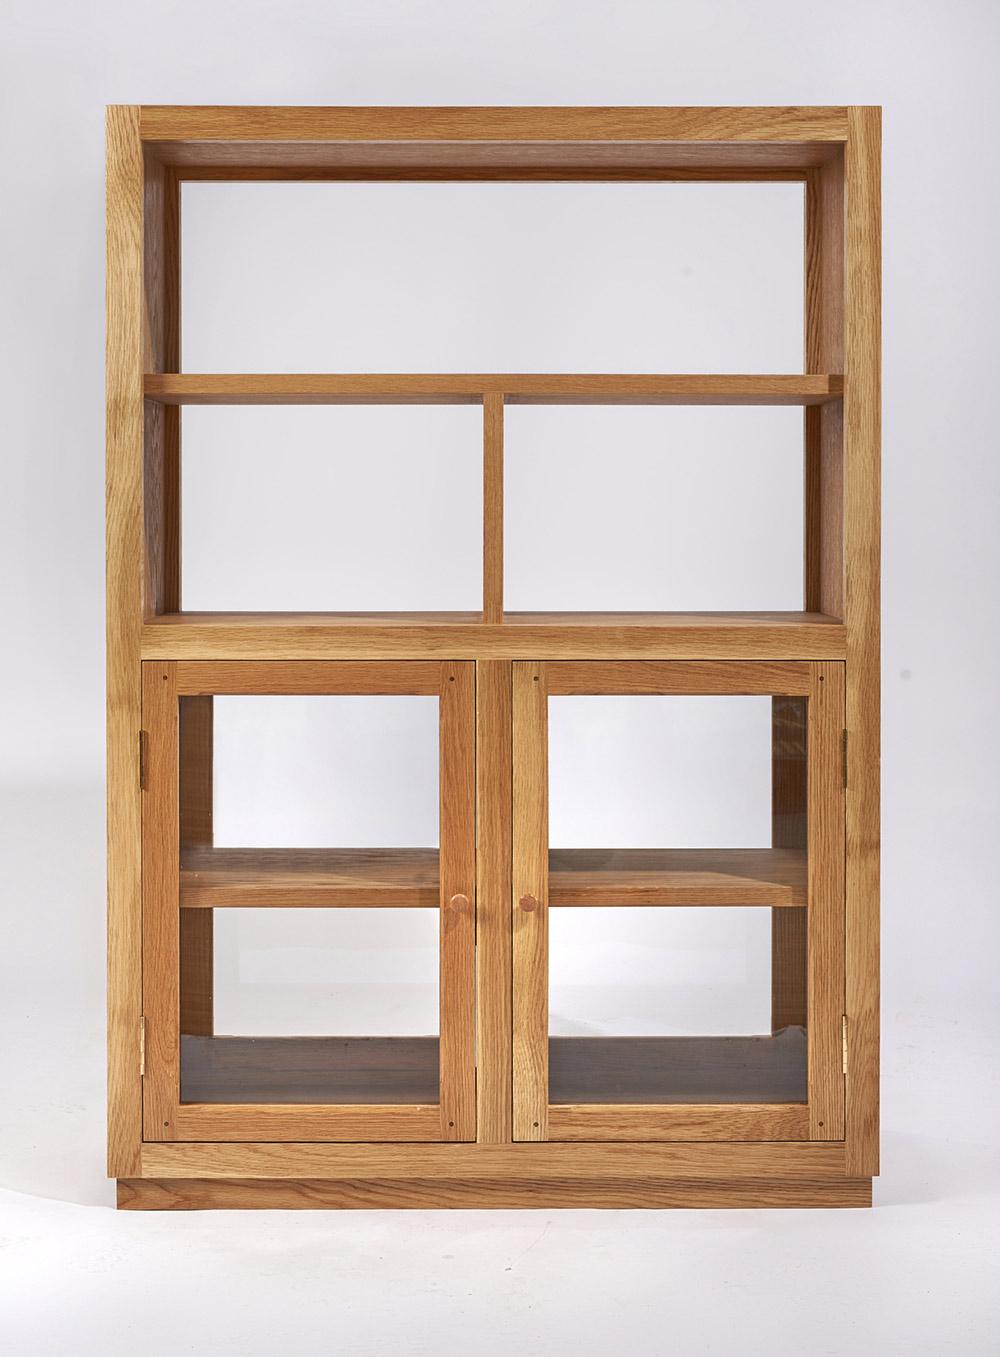 charlie-caffyn-designs-oak-and-glass-display-cabinet